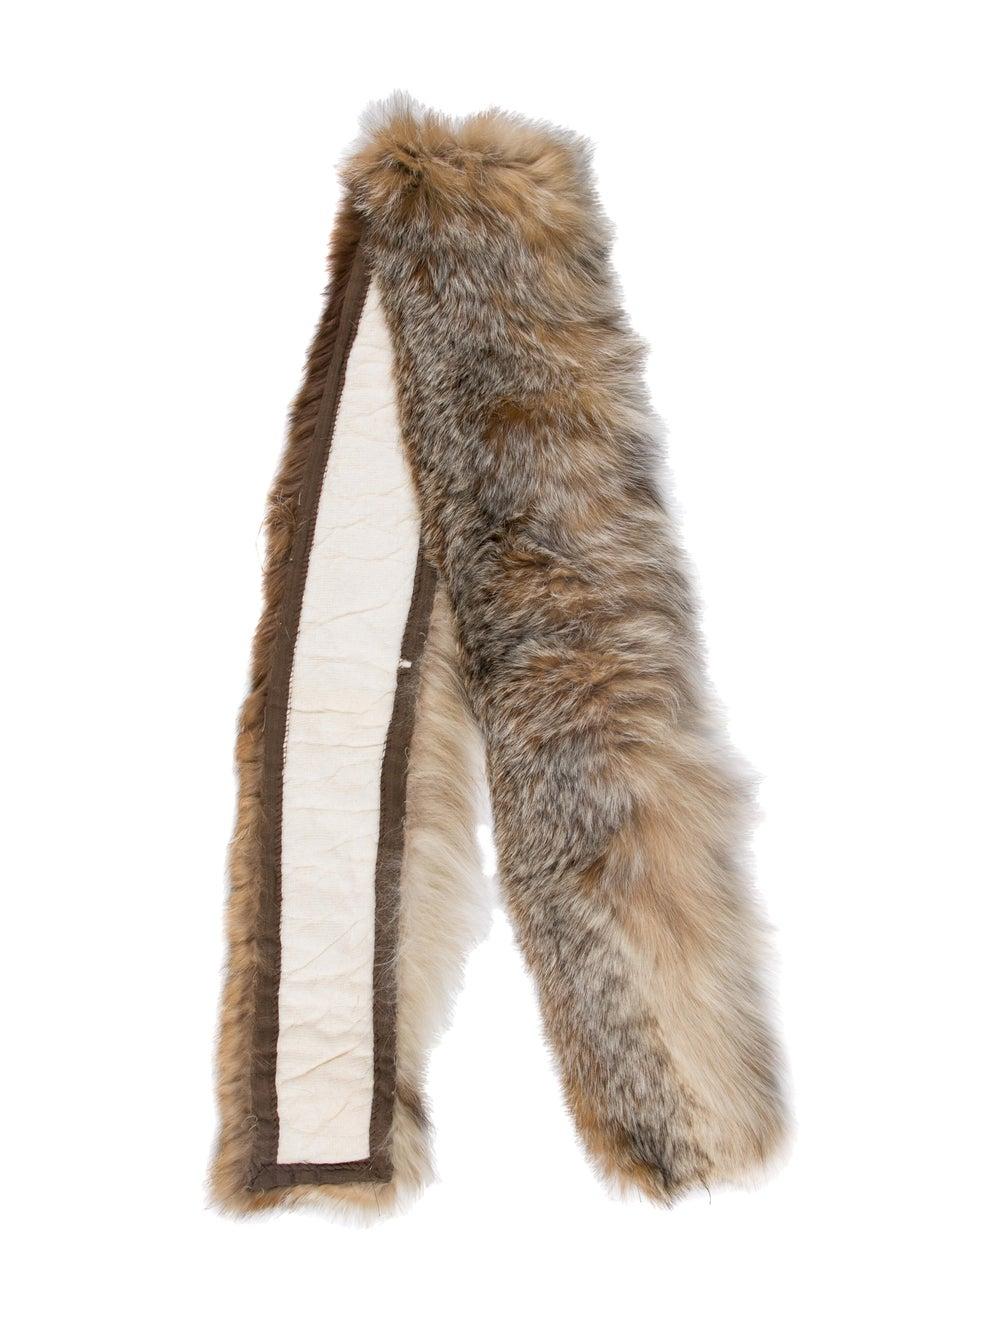 Fur Coyote Stole - image 1